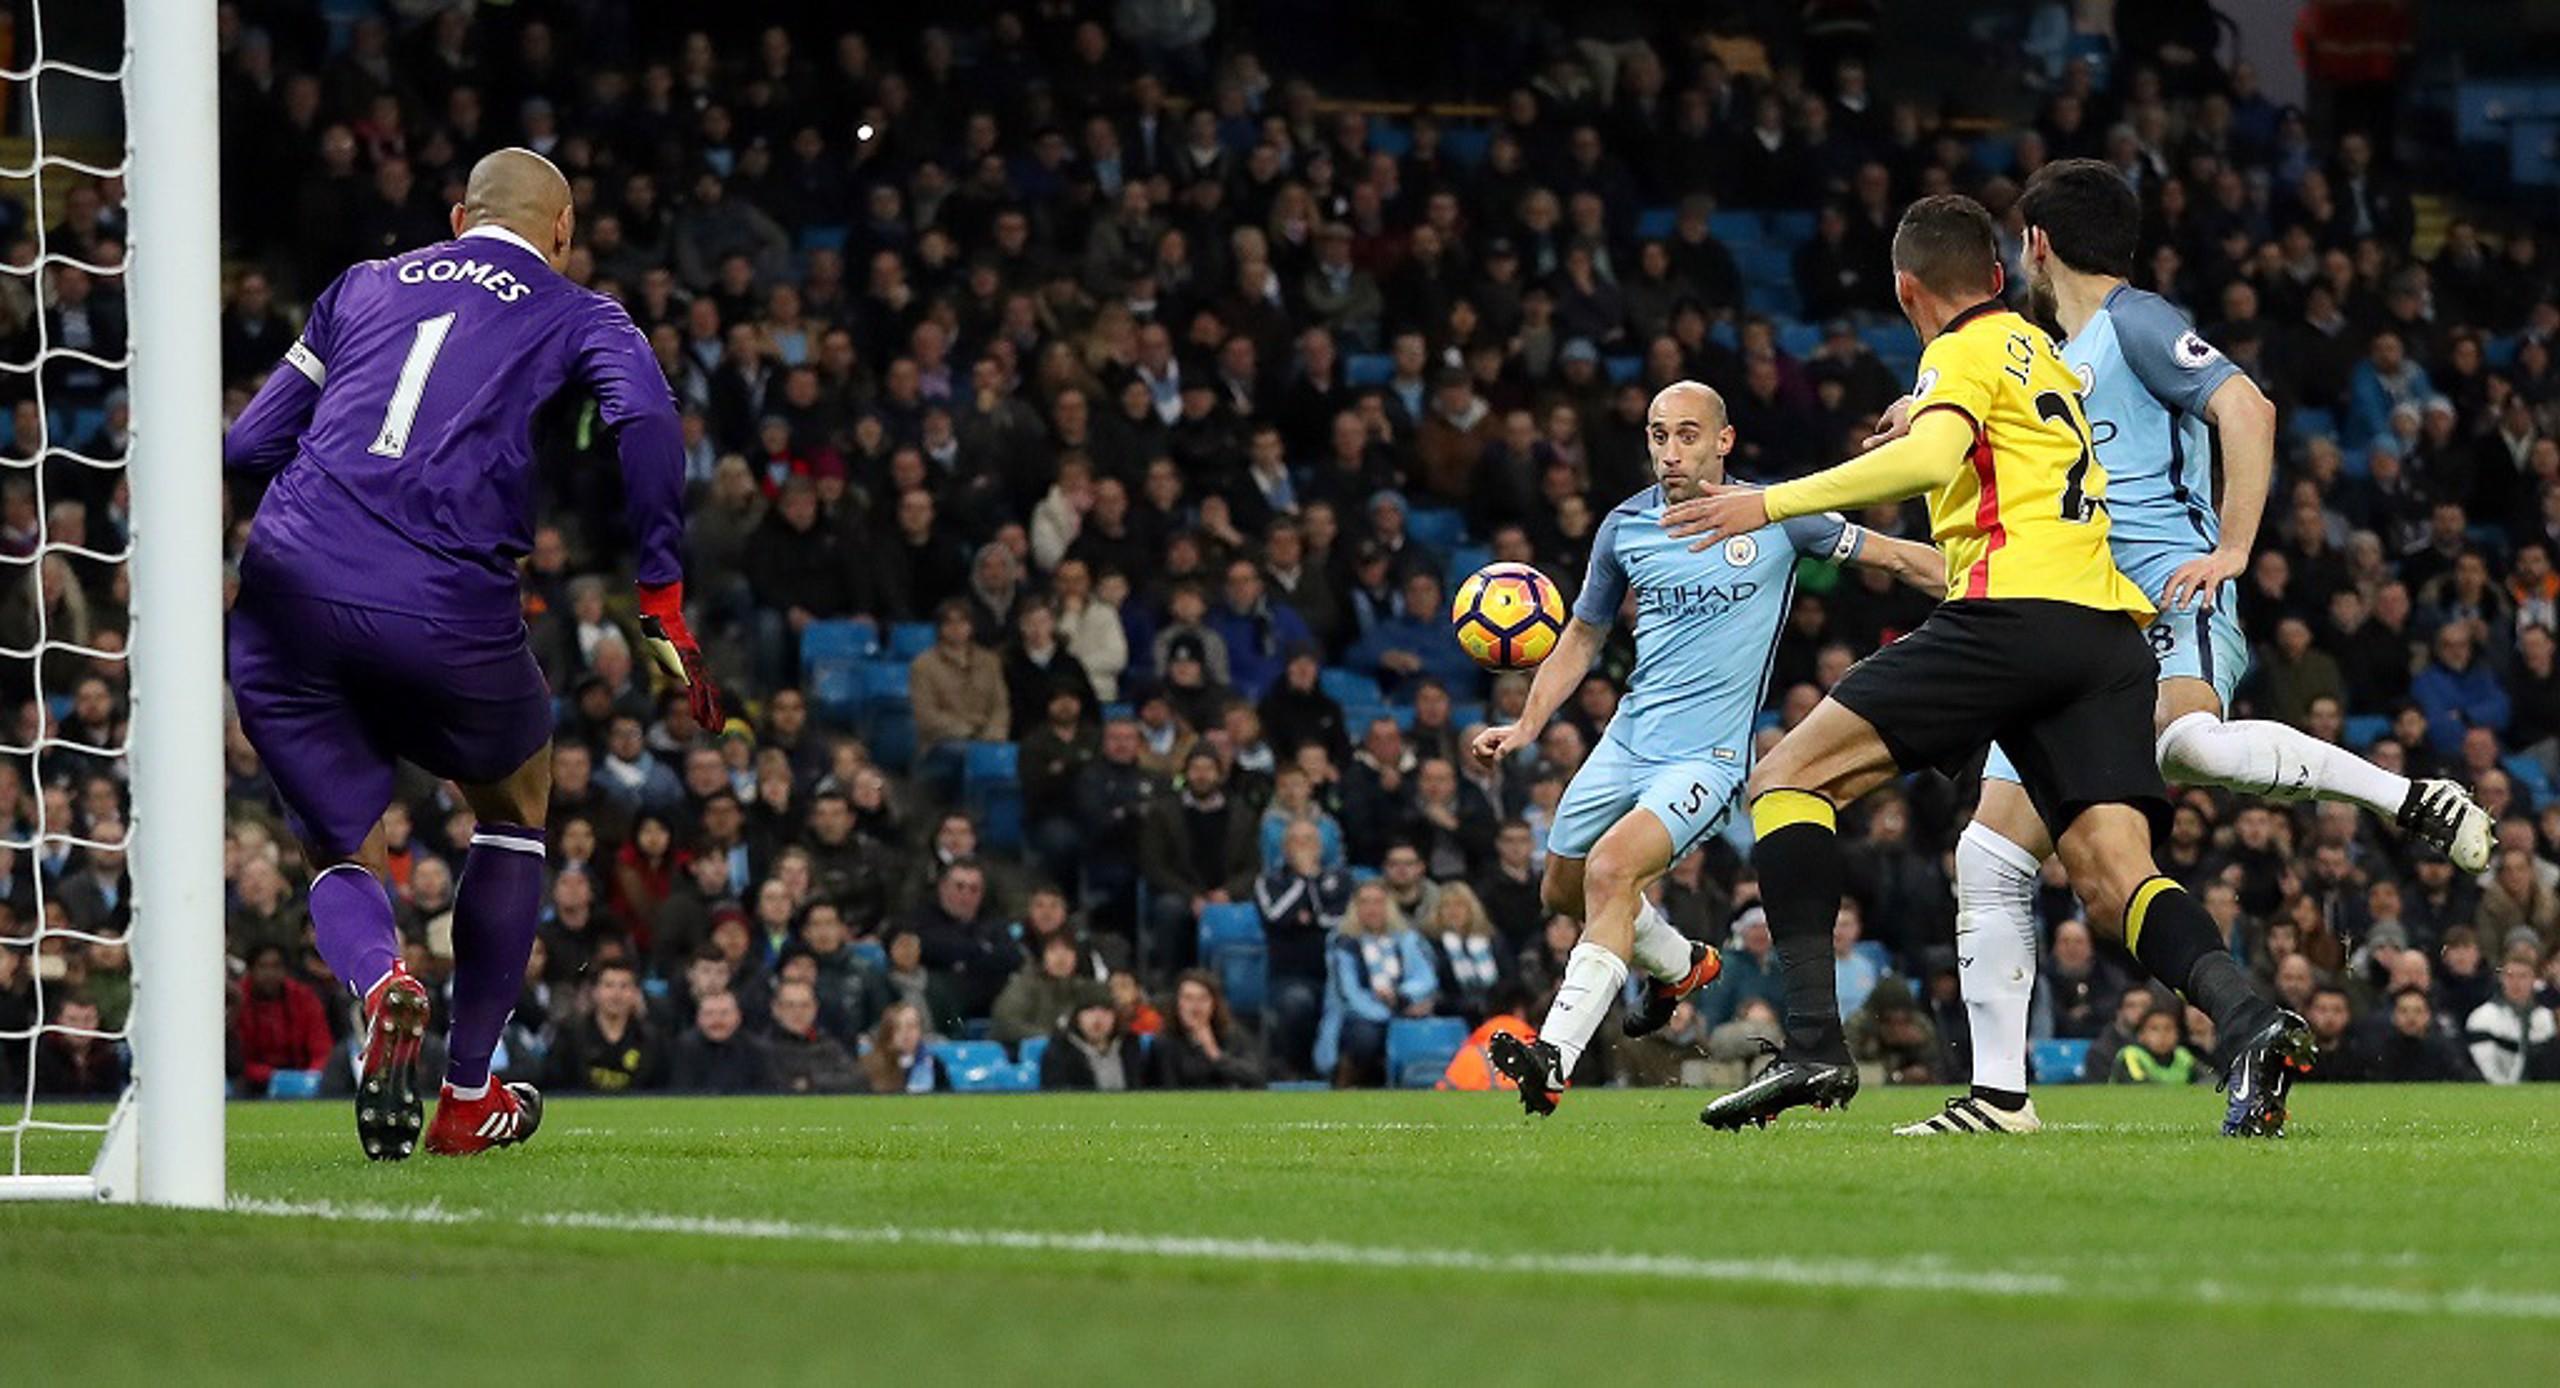 City return to winning ways with comfortable win